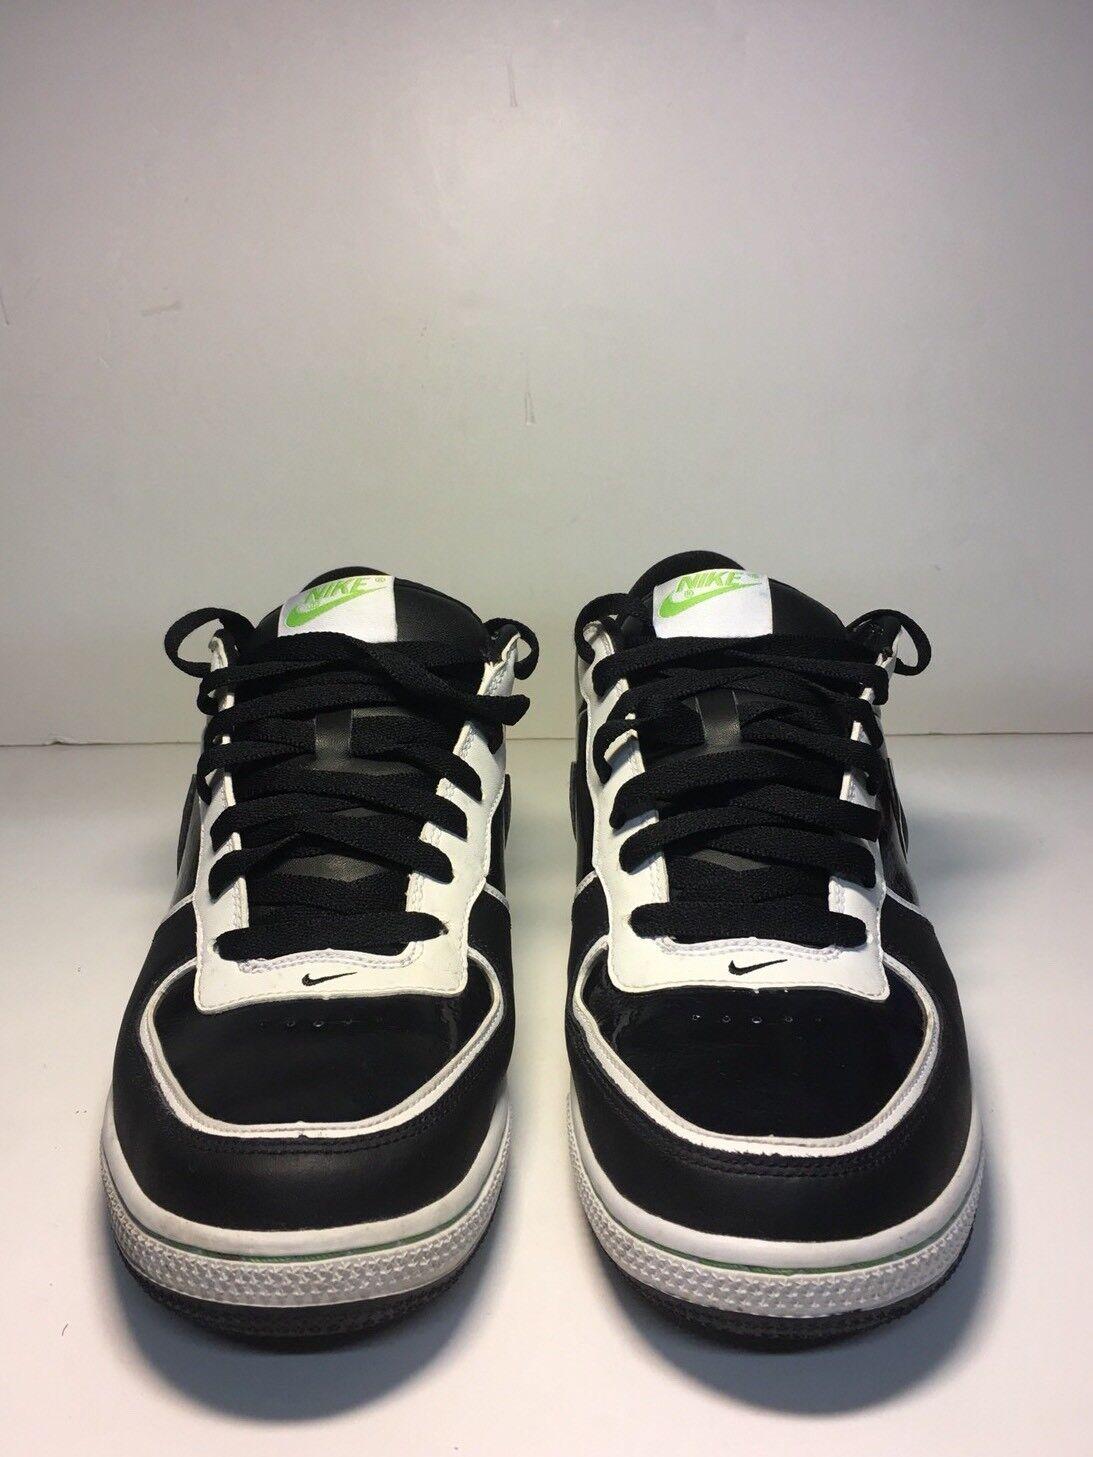 Nike Zoom Infiltrator II Black White Green Size 9.5 Men's